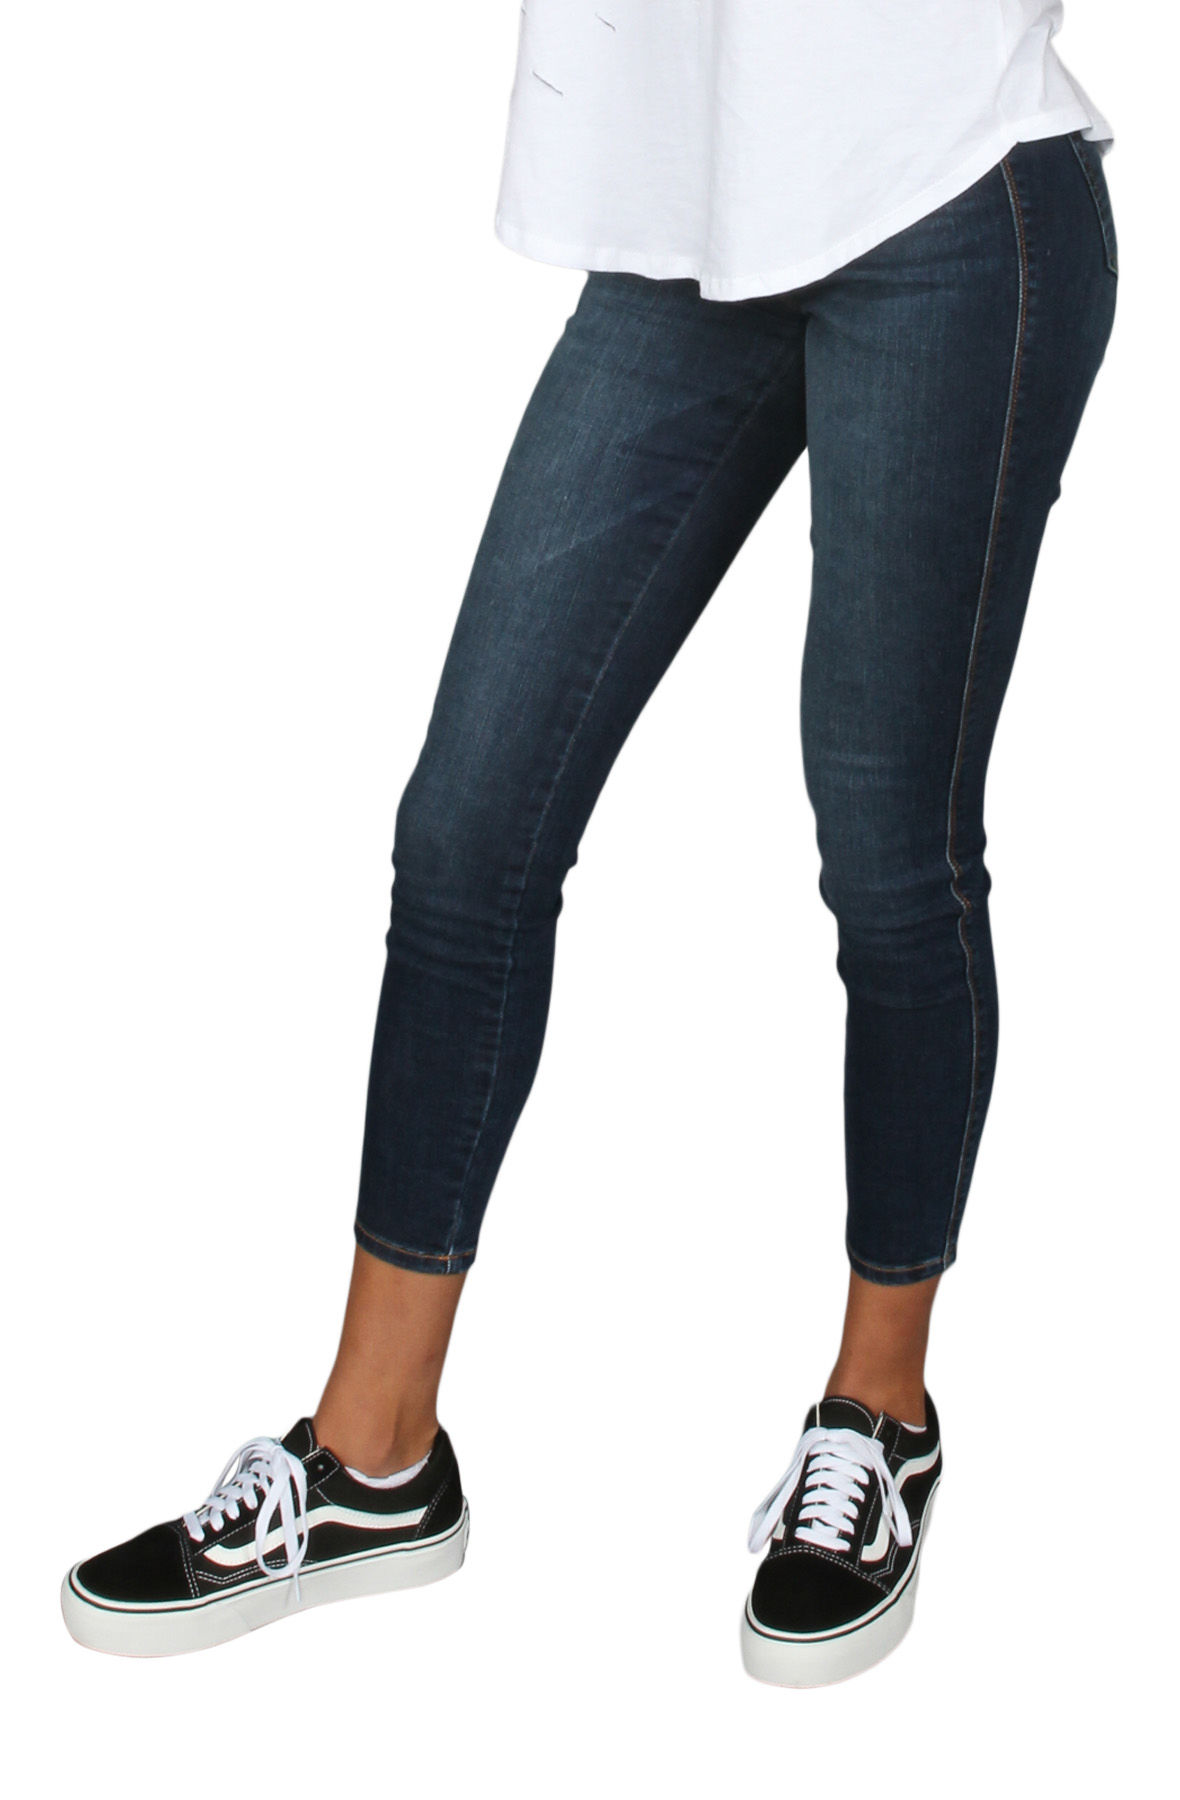 Image of The High Rise Skinny Jeans in Dark Denim